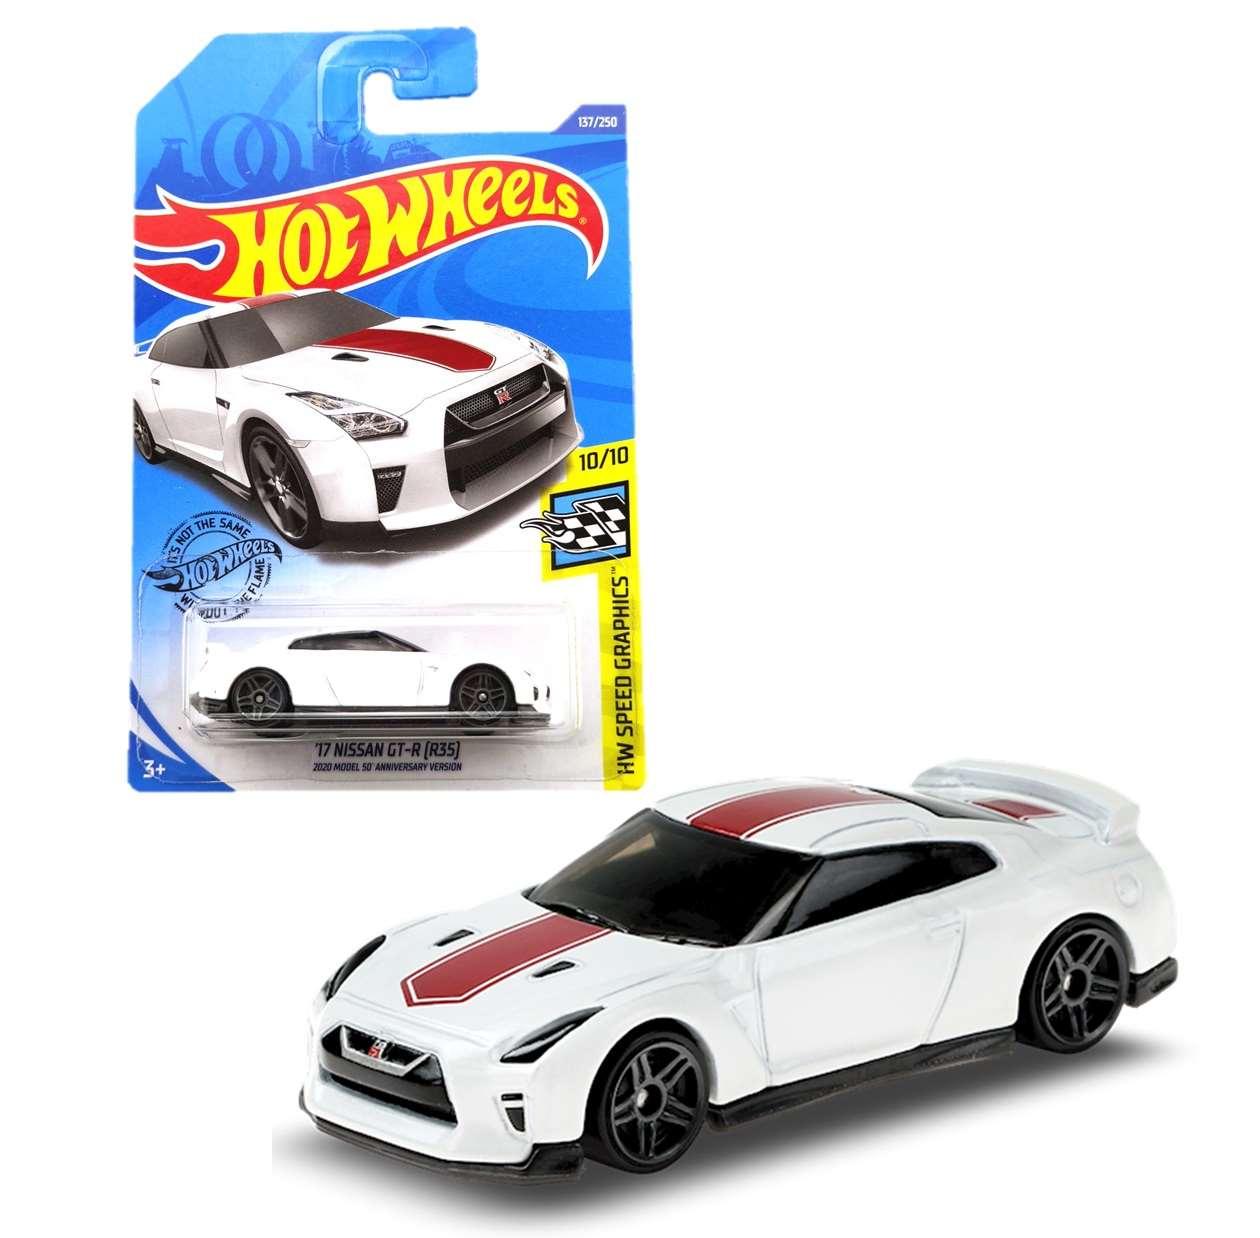 17 Nissan Gt R ( R35 ) 137/250 Hot Wheels Hw Speed Graphics